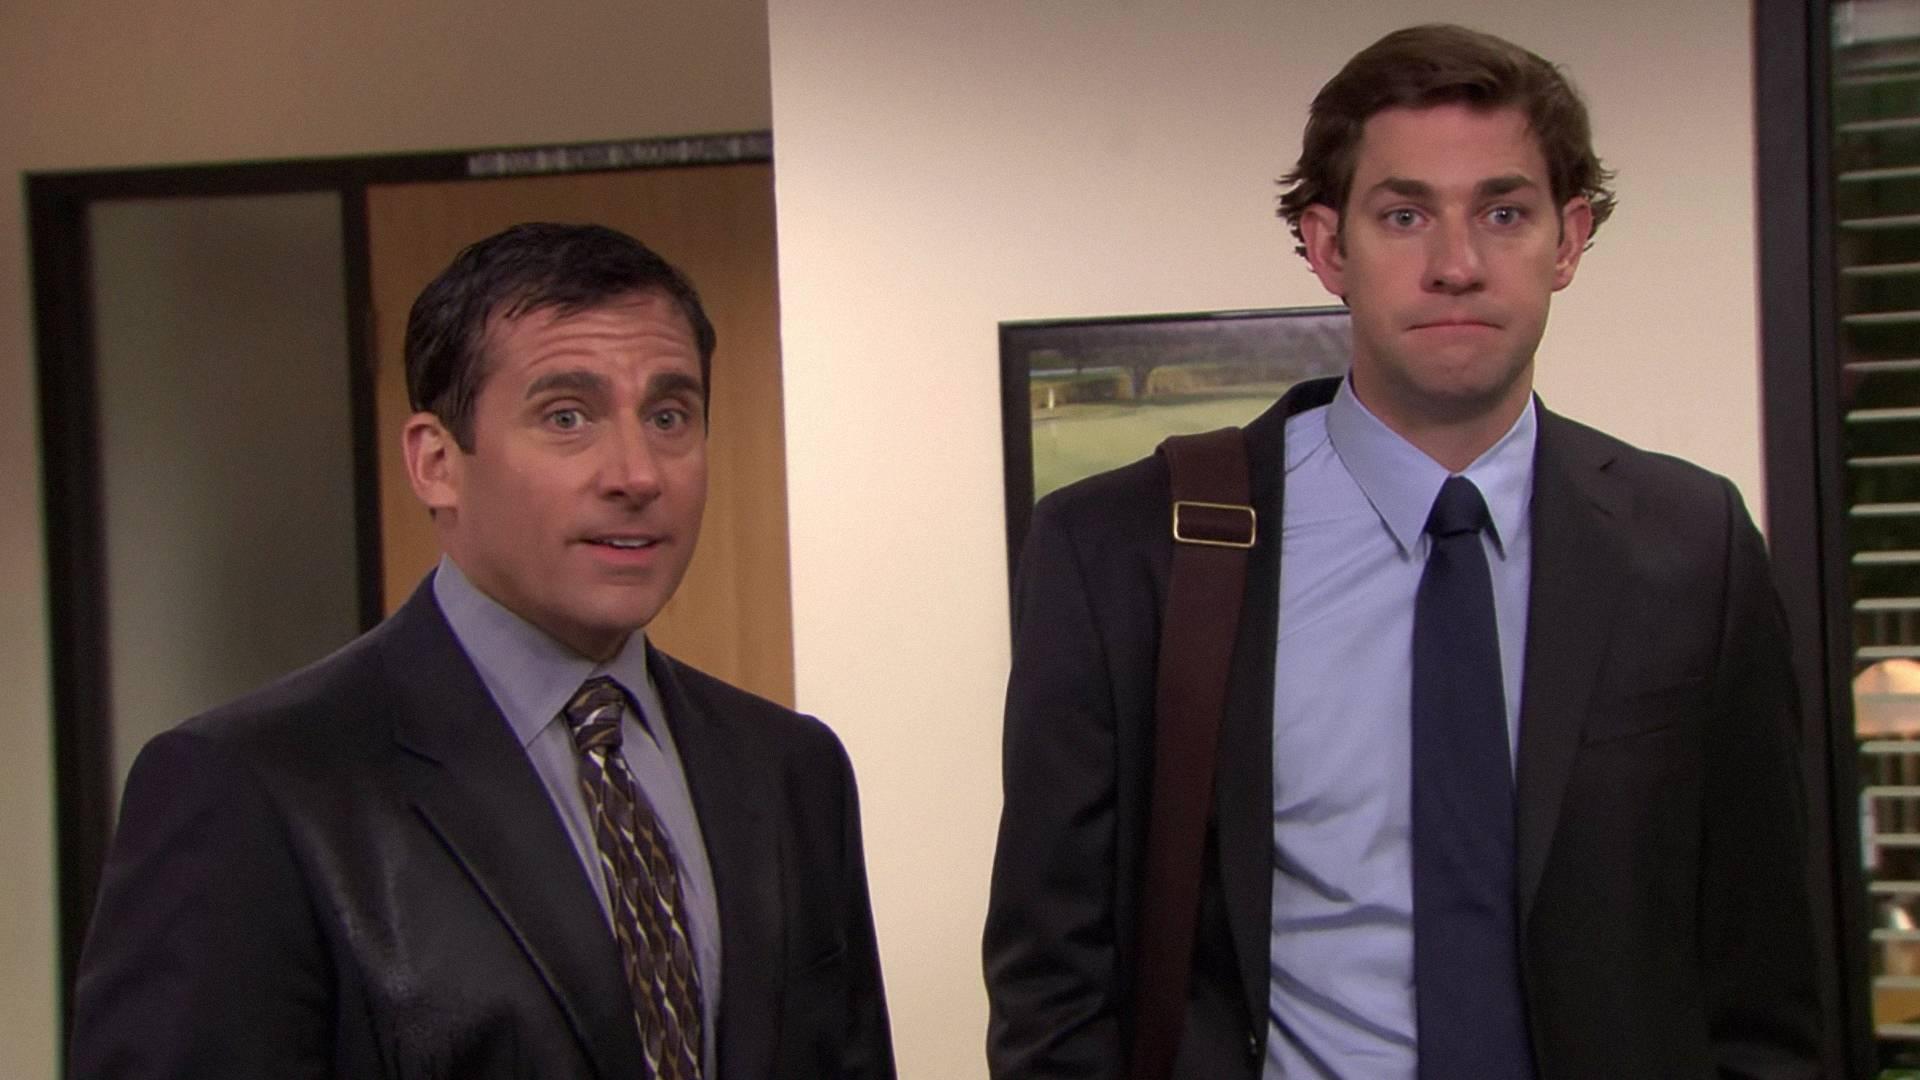 The Office Season 6 Episode 8